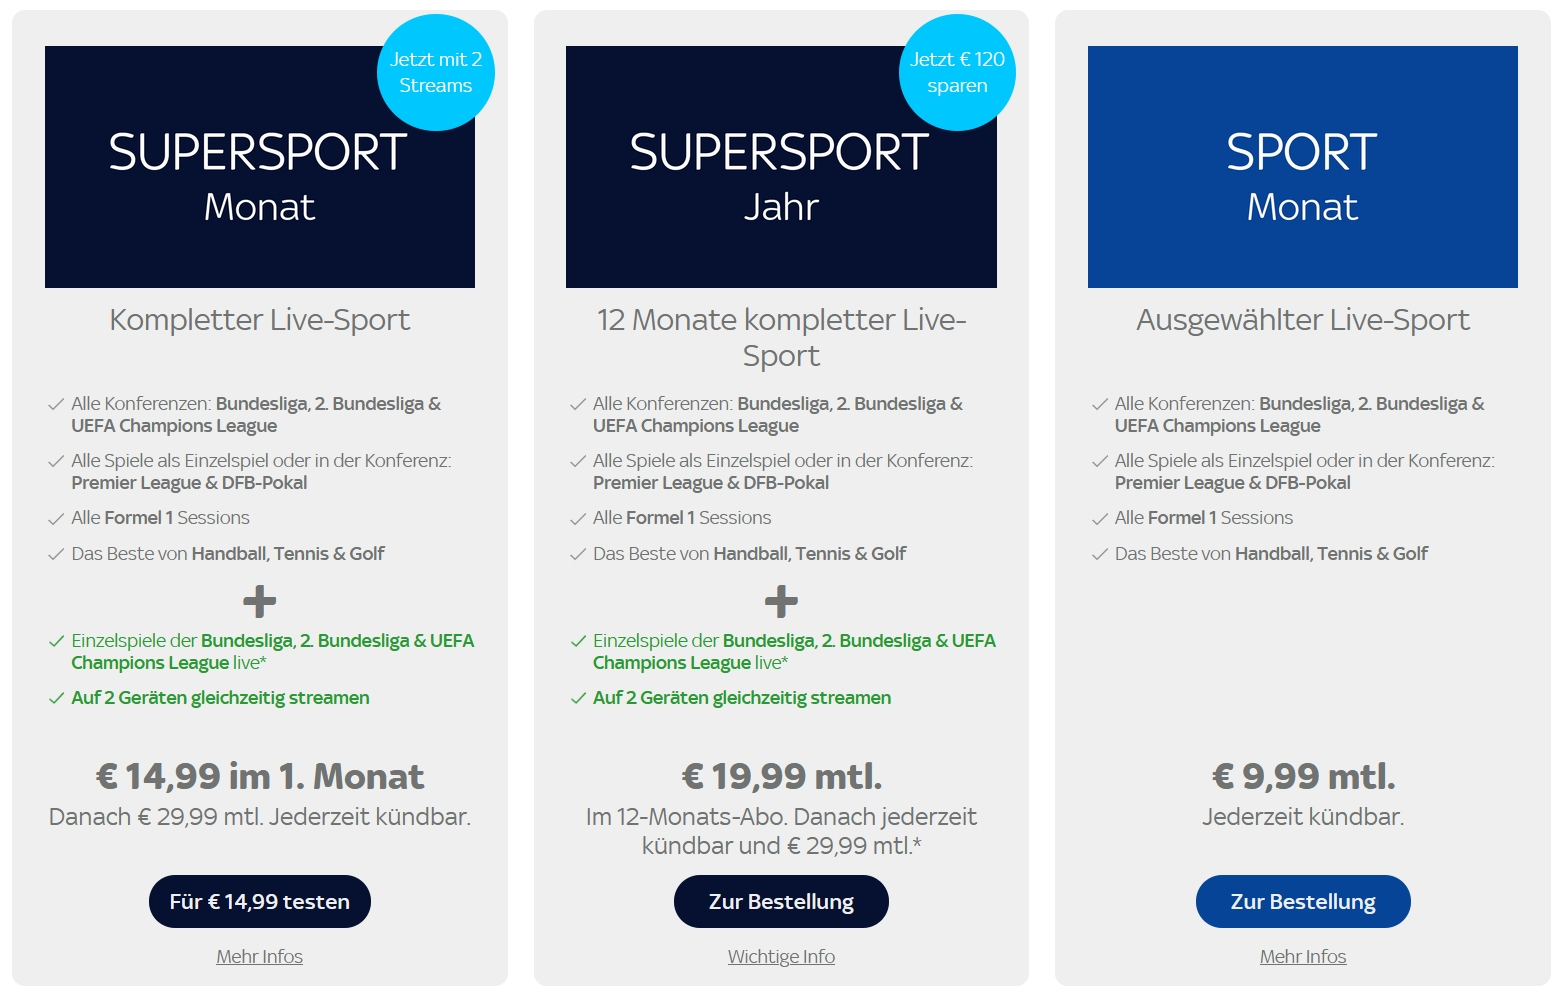 sky-ticket-supersport-angebote